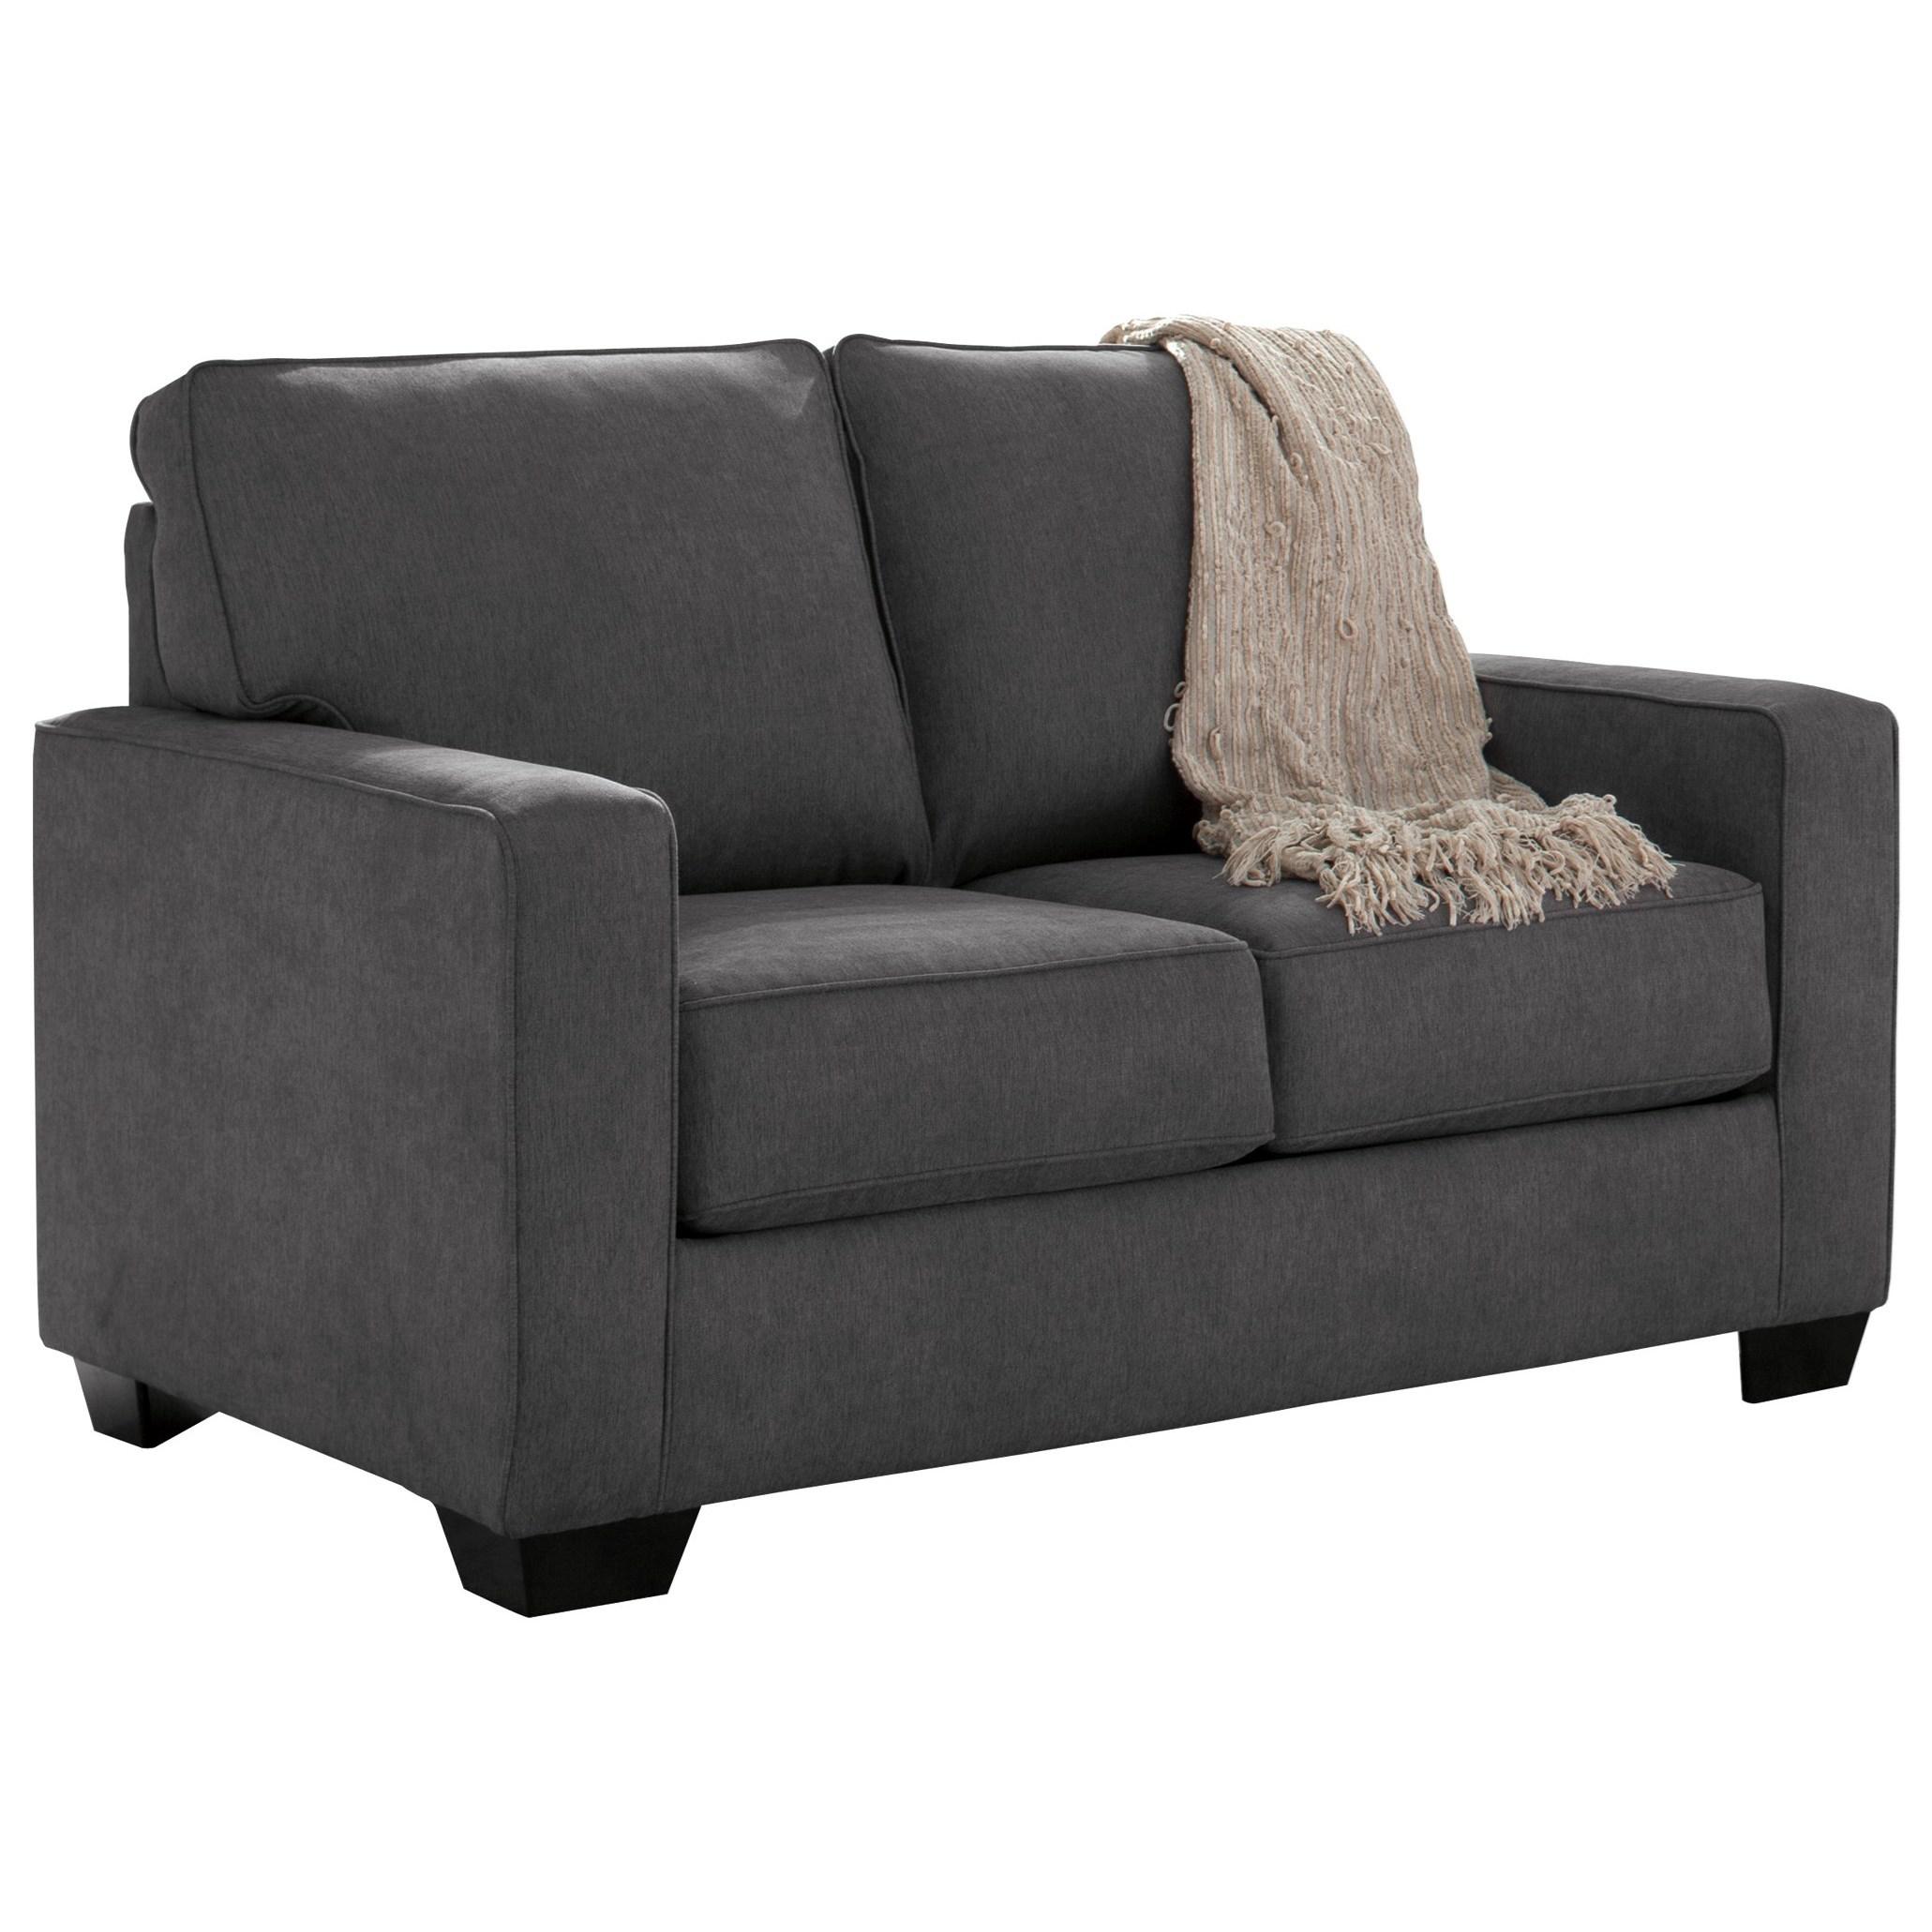 Signature Design By Ashley Zeb Twin Sofa Sleeper With Memory Foam Mattress